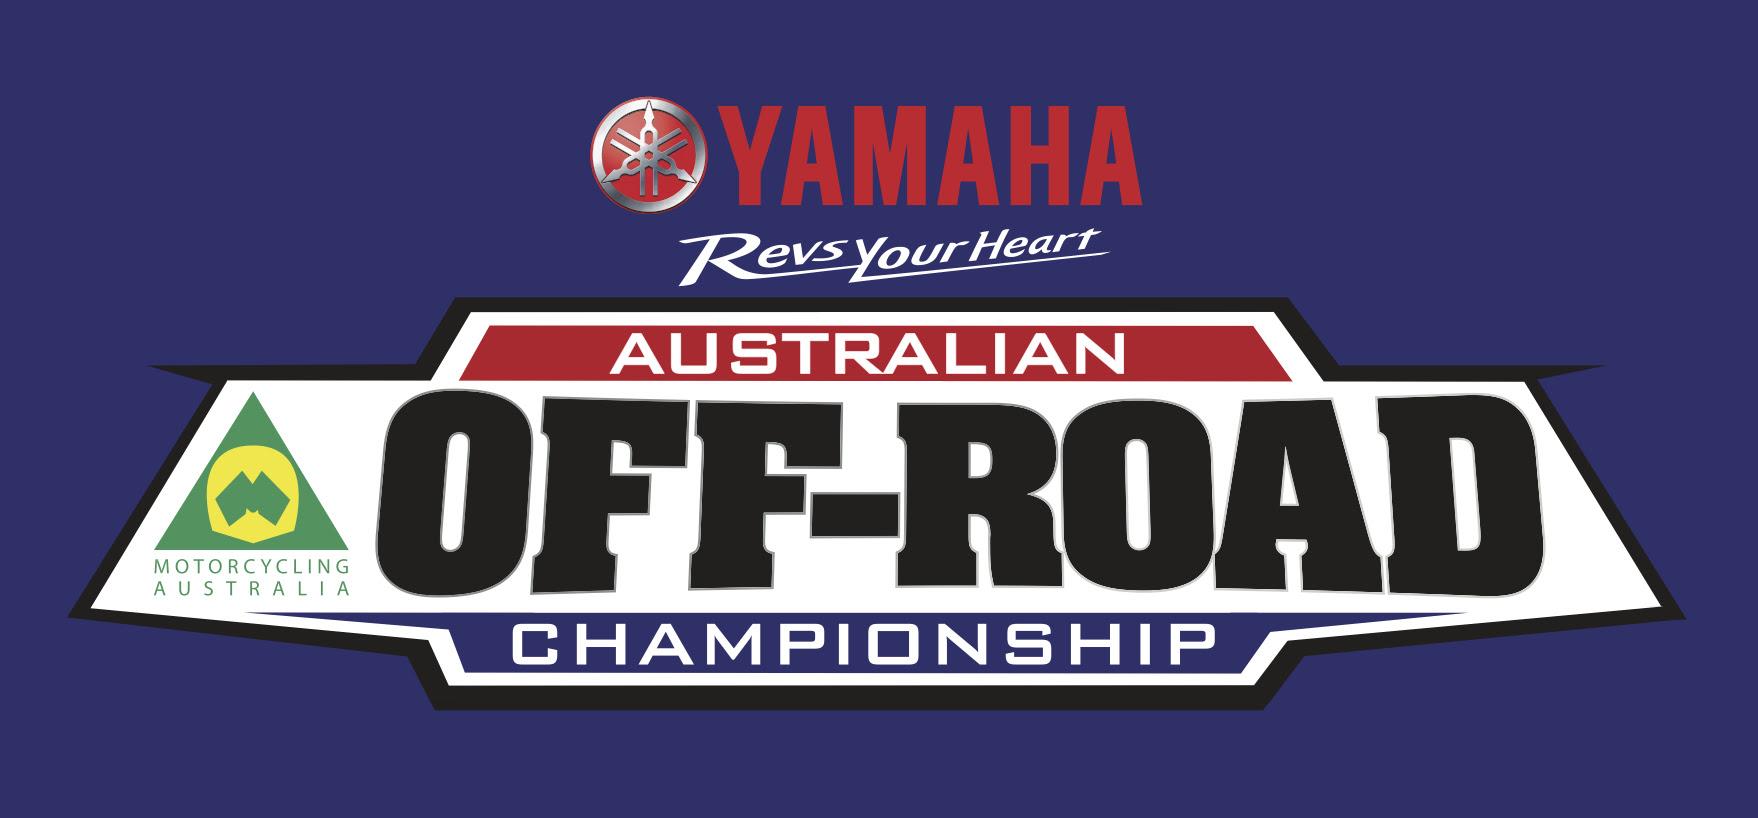 2017 Yamaha Australian Off Road Championship